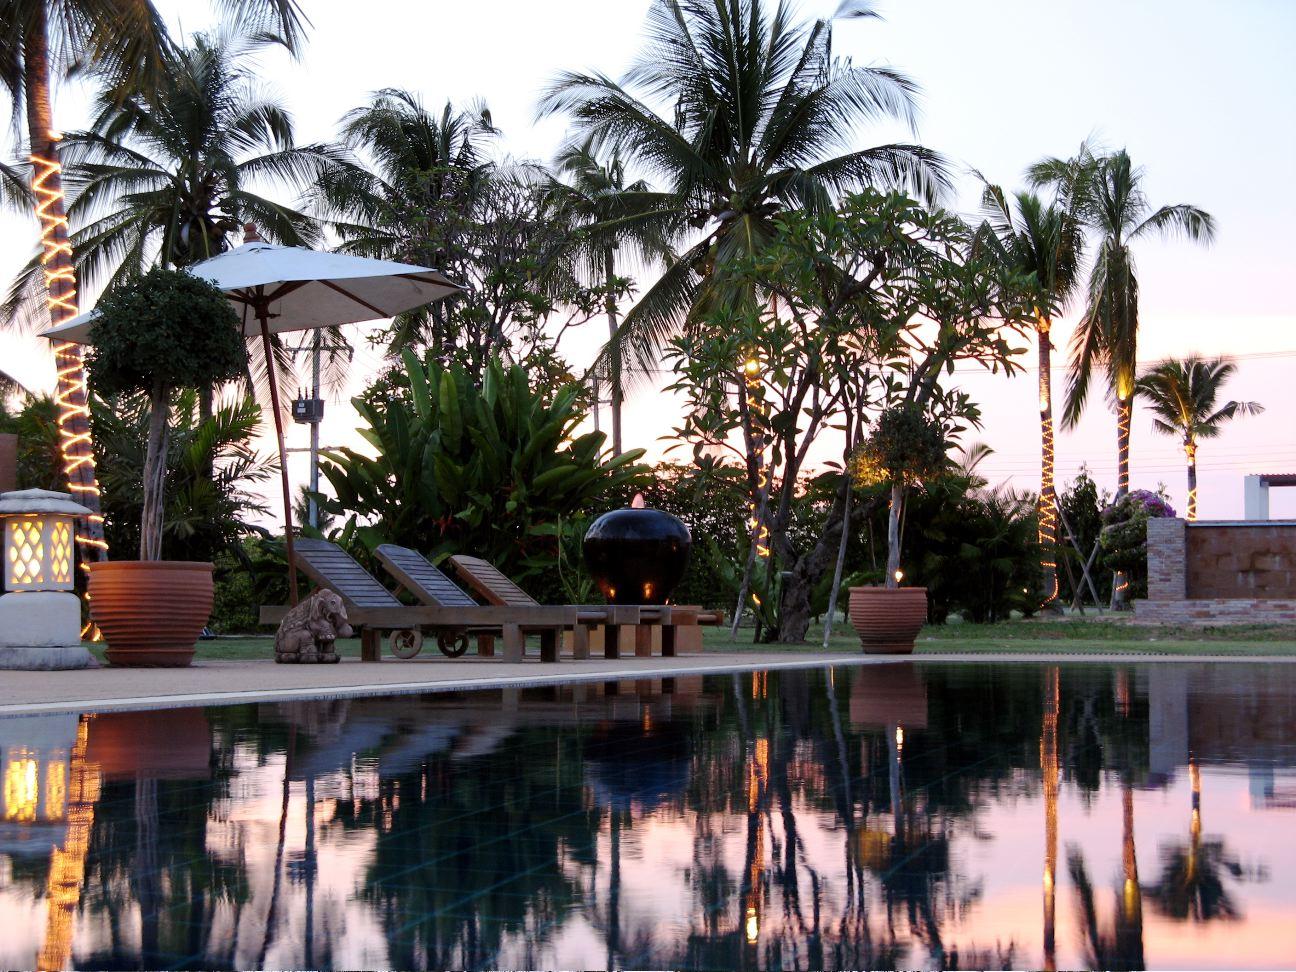 Mmmm, backyard serenity!